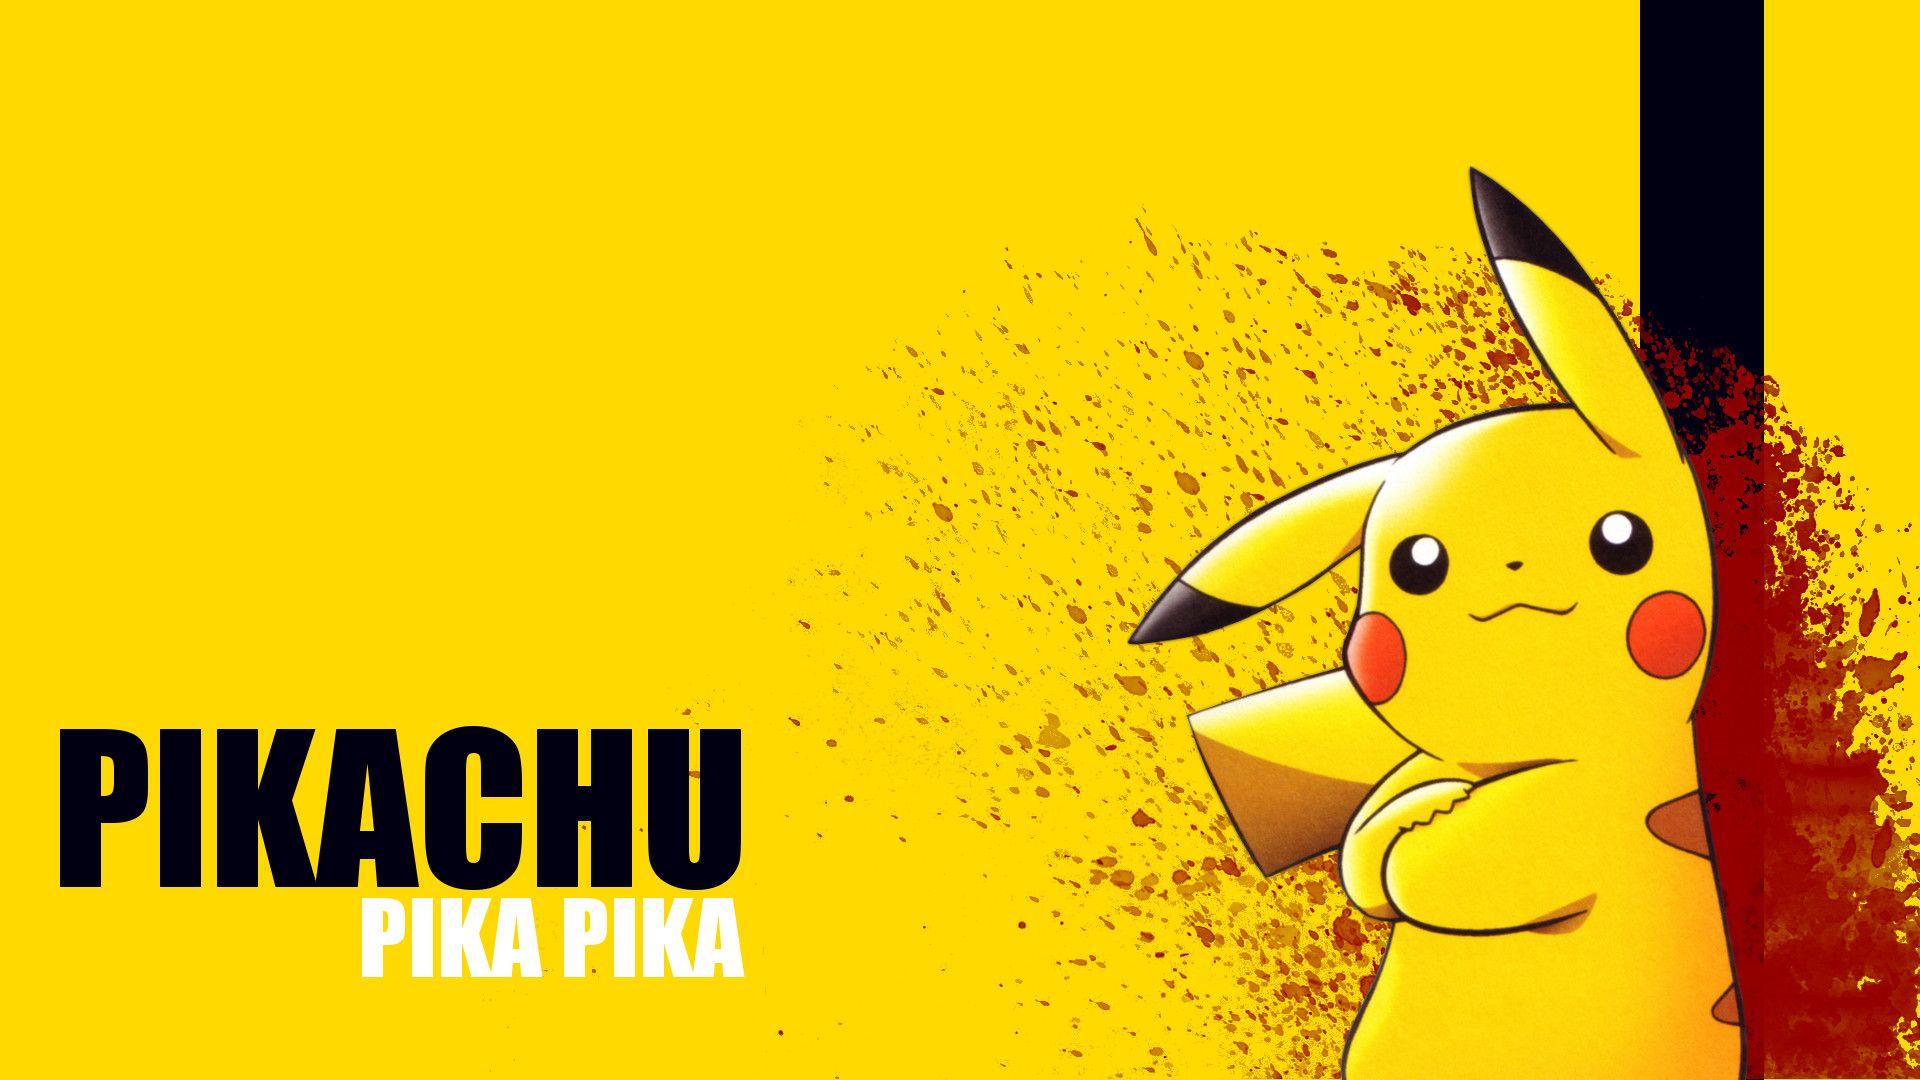 Pikachu Images Hd